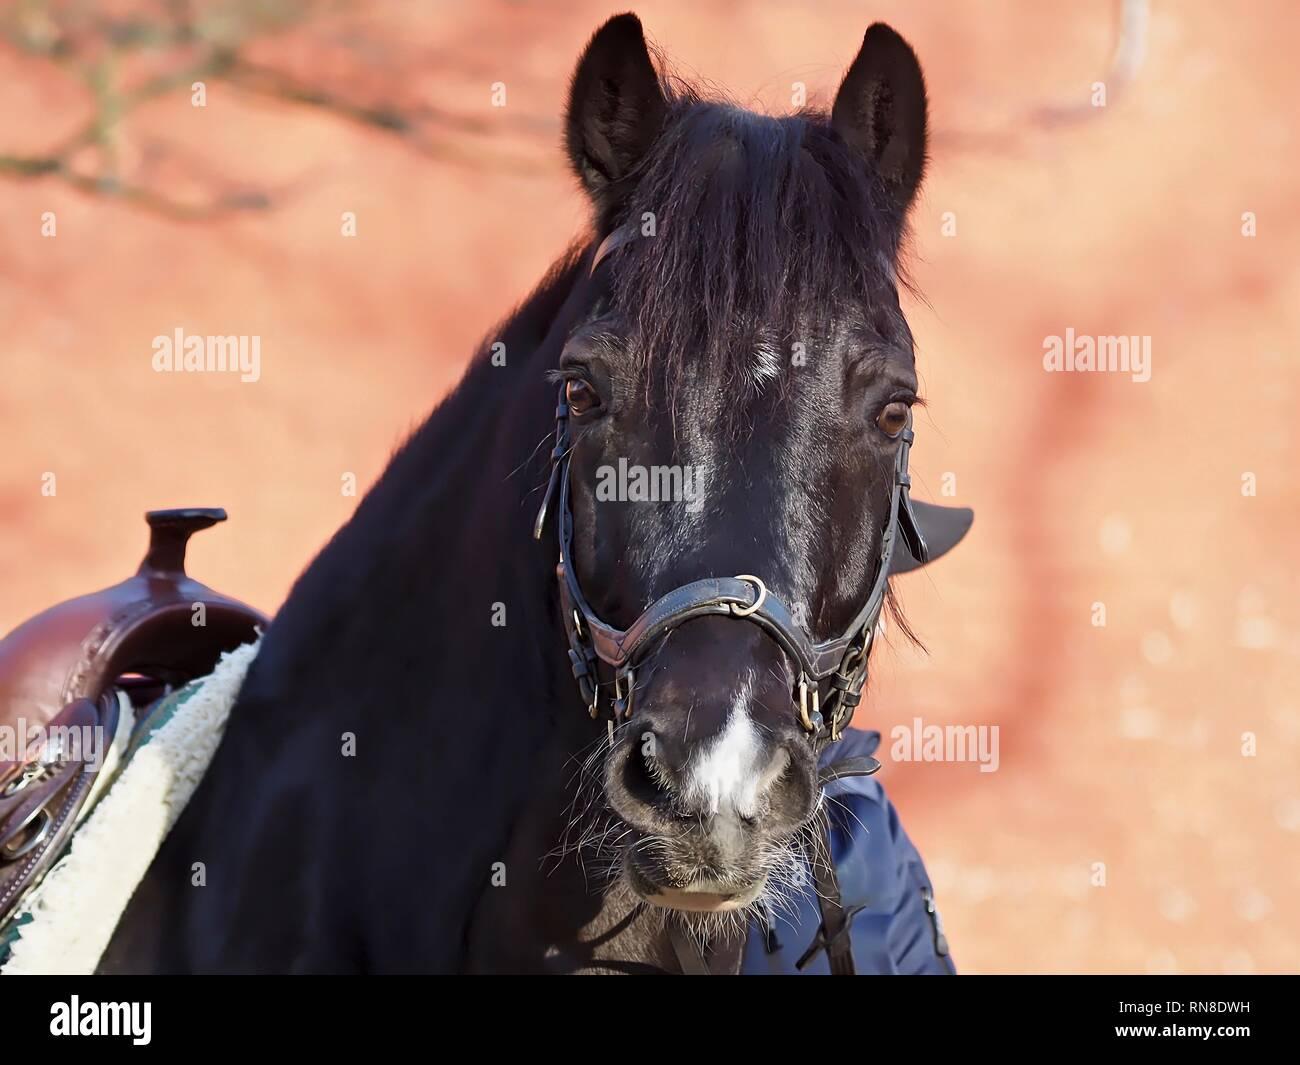 Isolated Black Horse With A Western Saddle Stock Photo Alamy